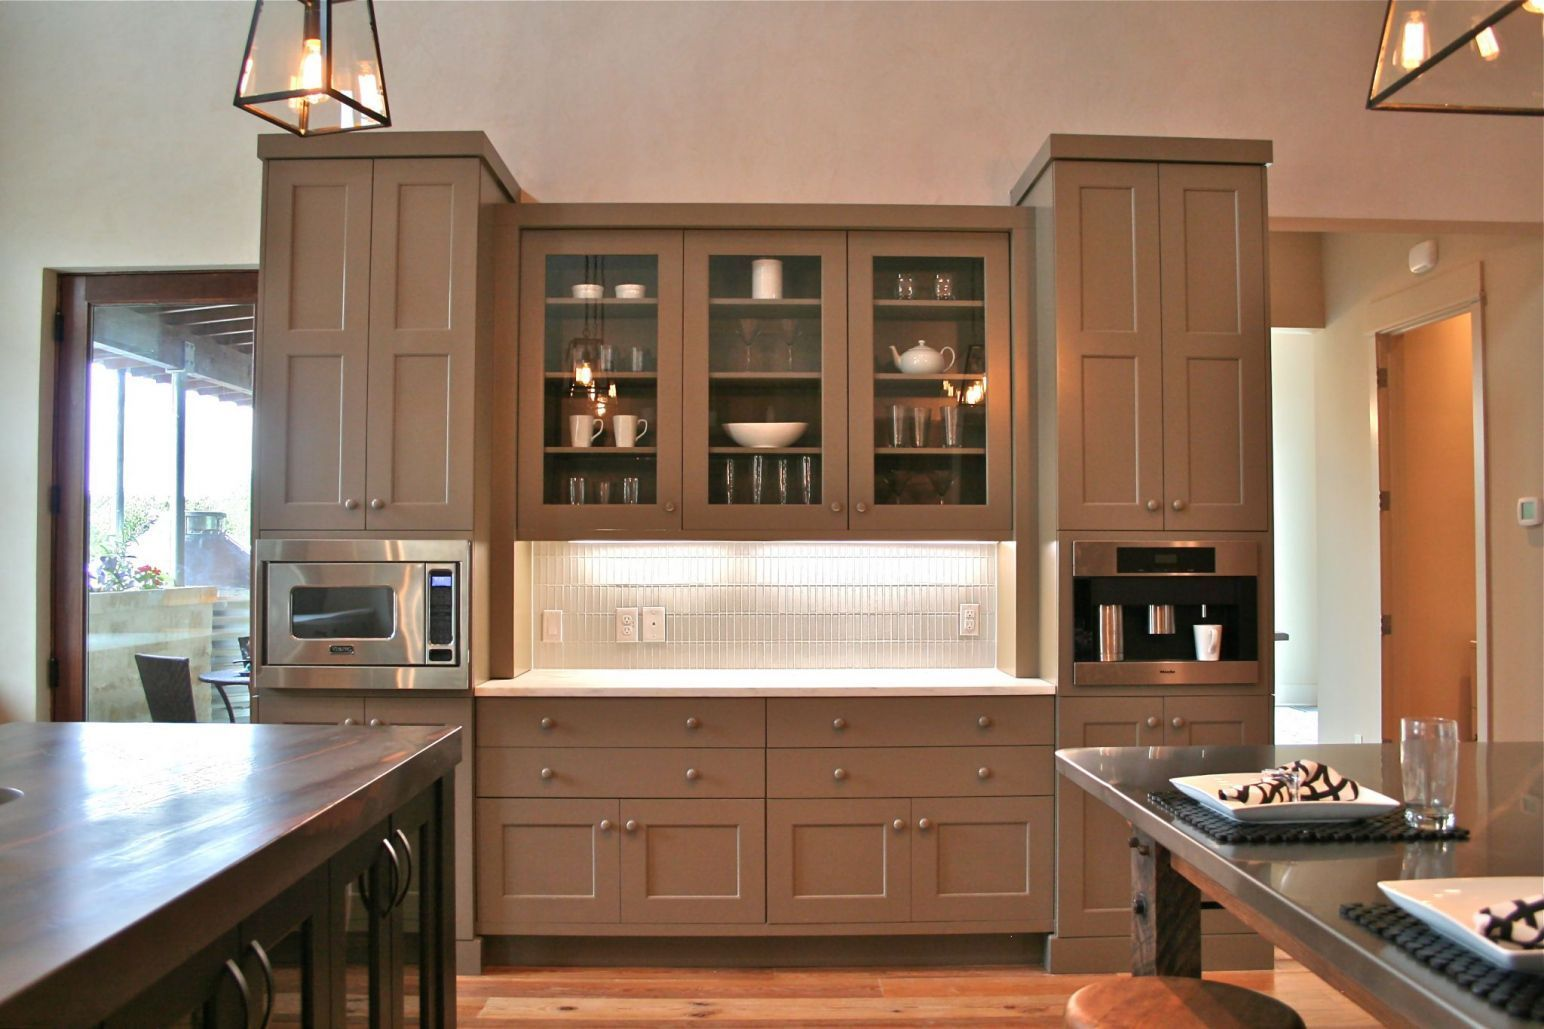 100+ Denver Kitchen Remodeling - Kitchen Remodel Ideas for Small ...